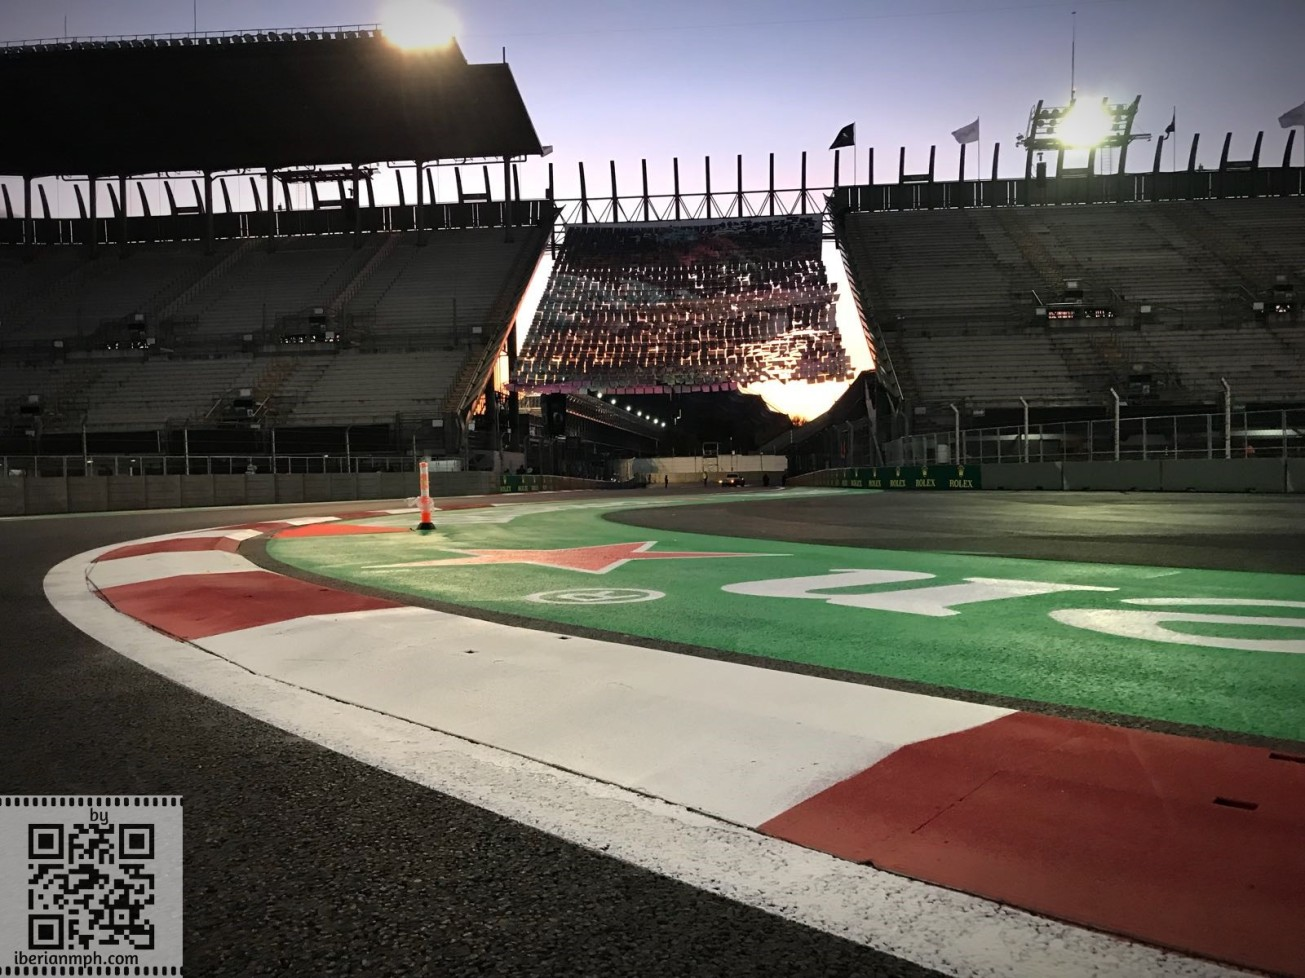 MexicoGP 2017 (11)